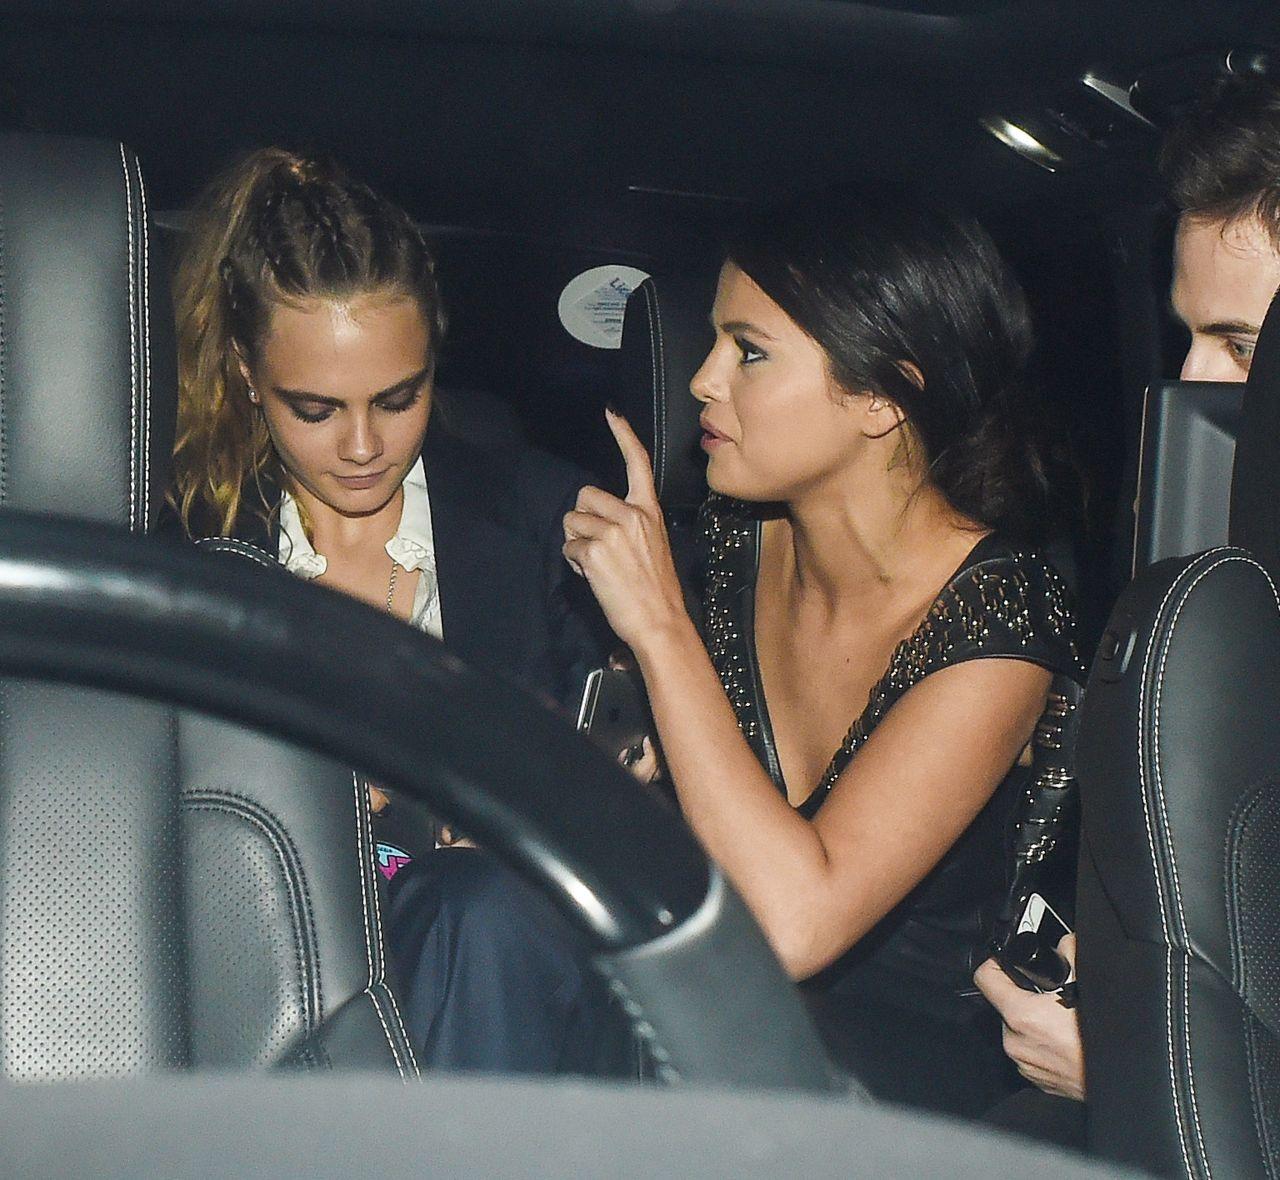 Selena Gomez & Cara Delevingne Out During London Fashion